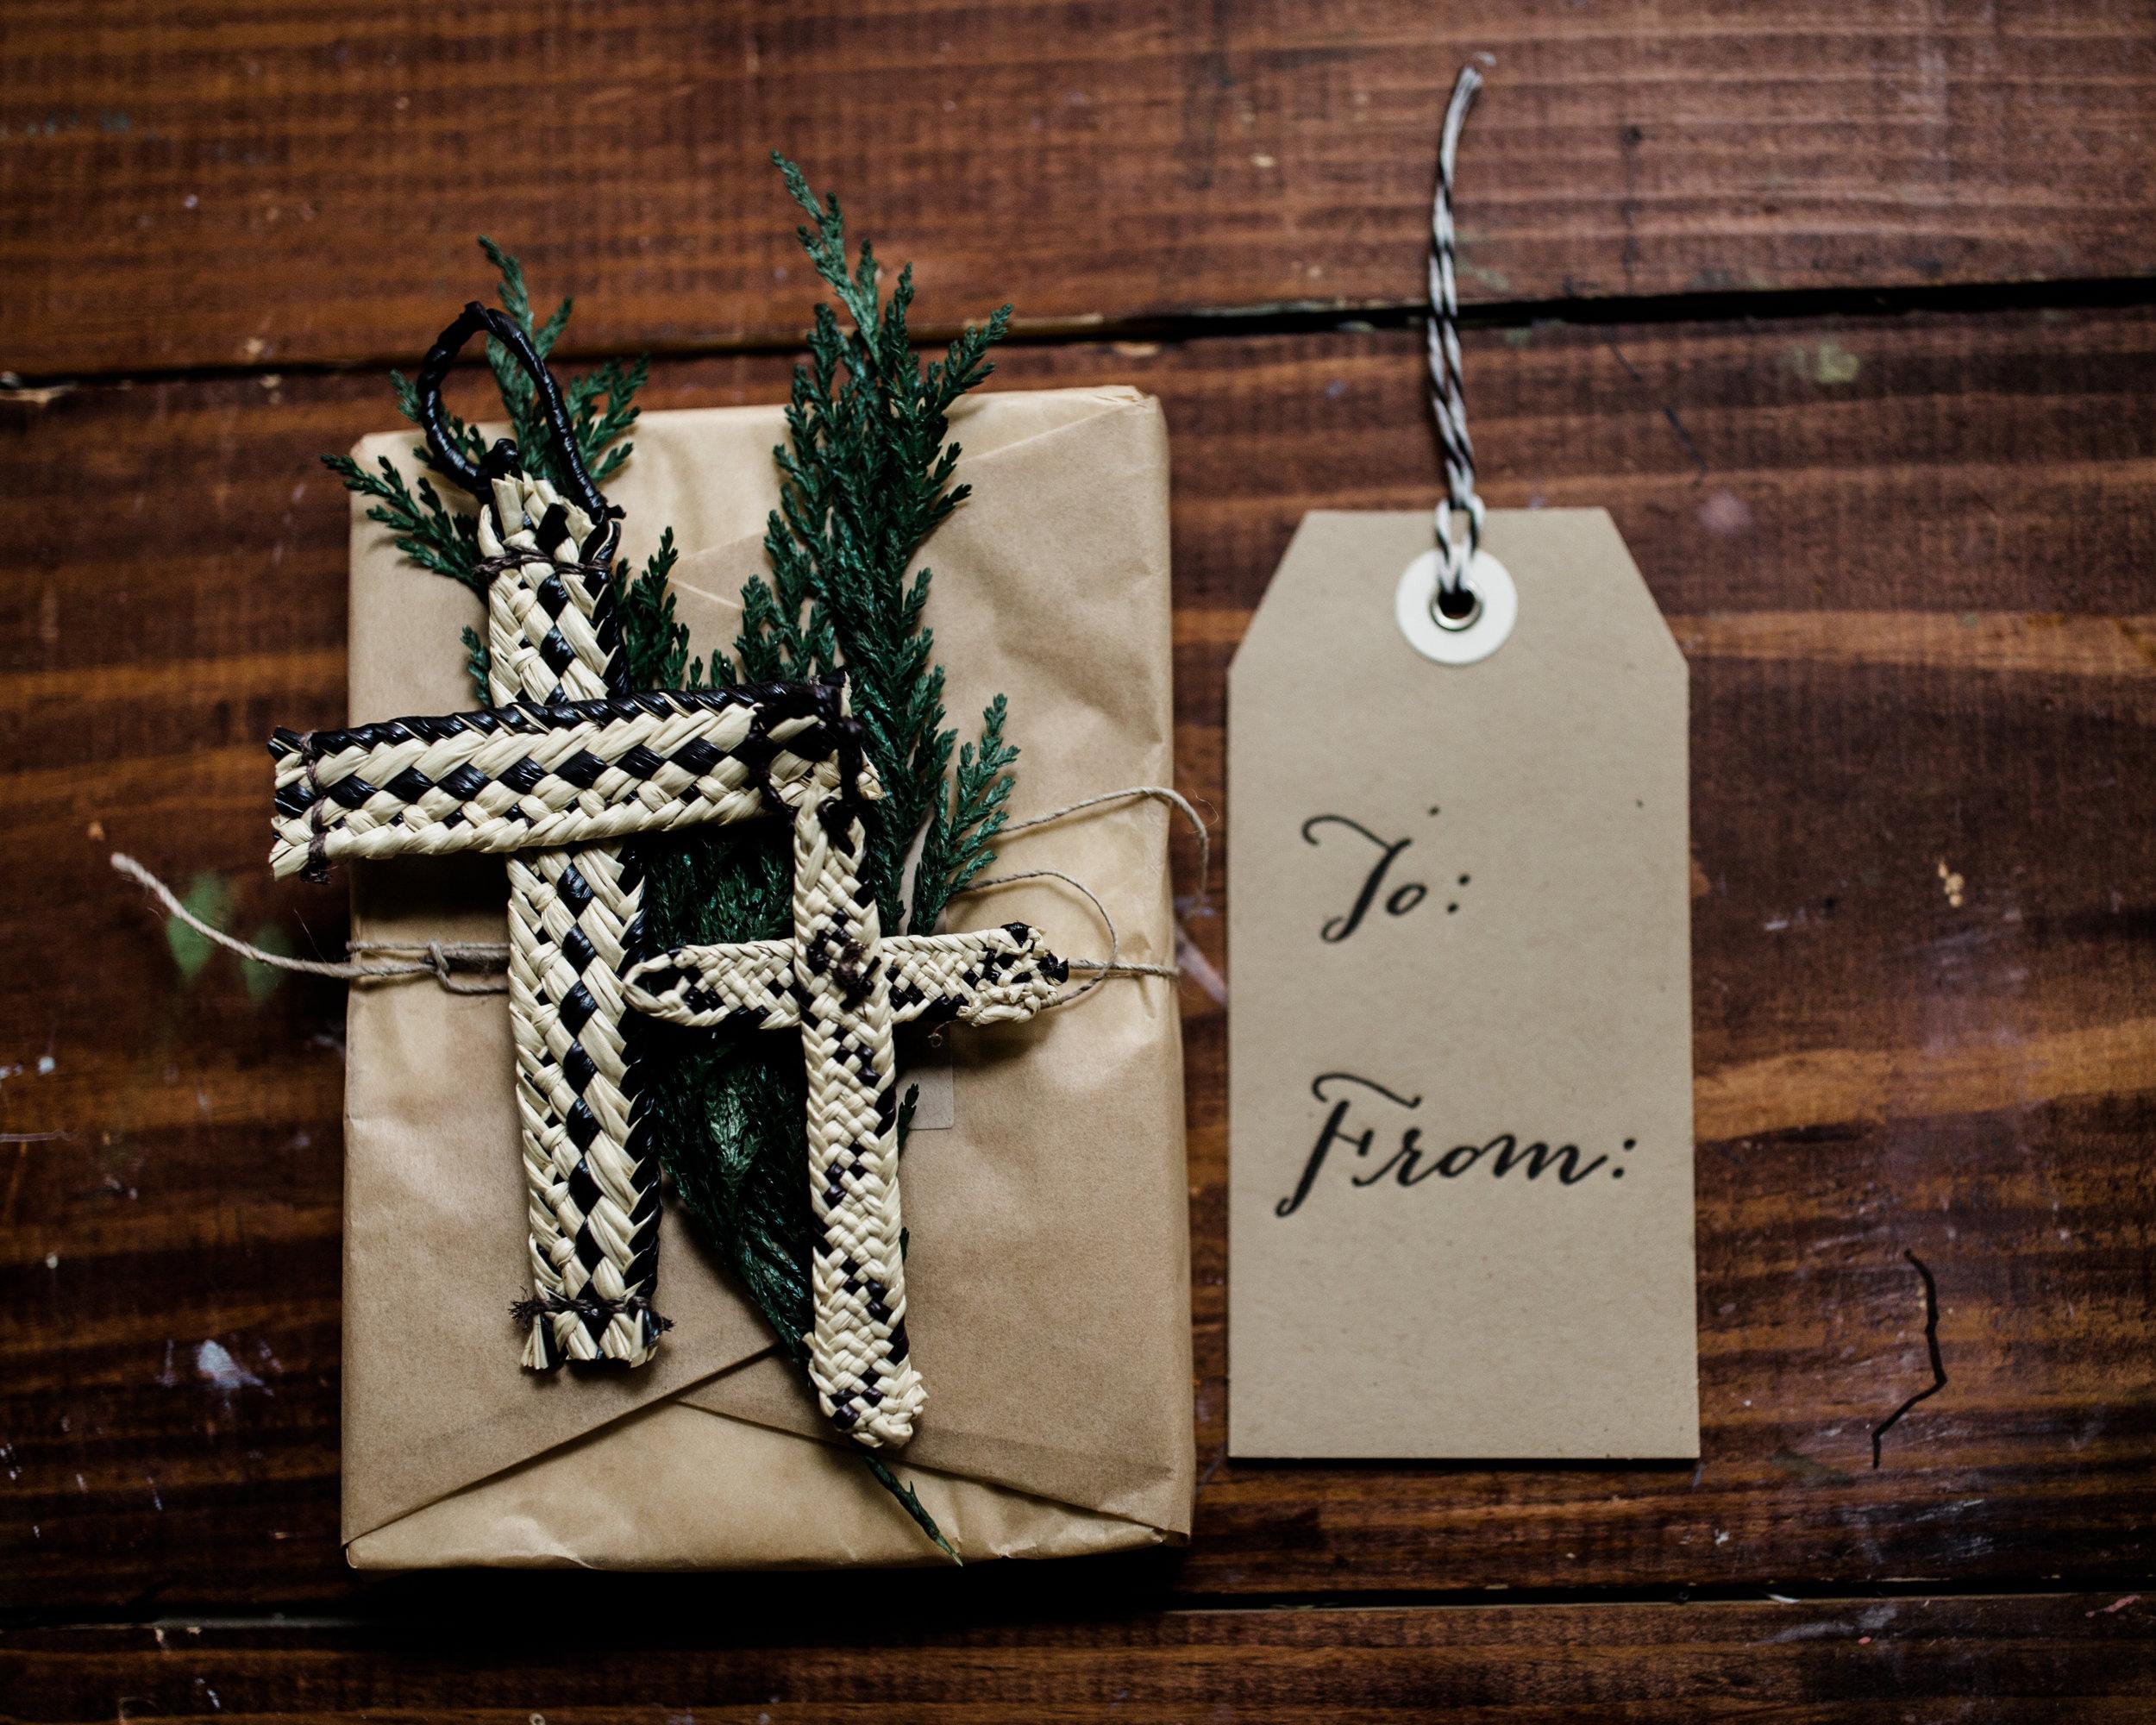 hands-producing-hope-costa-rica-christmas-crosses-0090.jpg